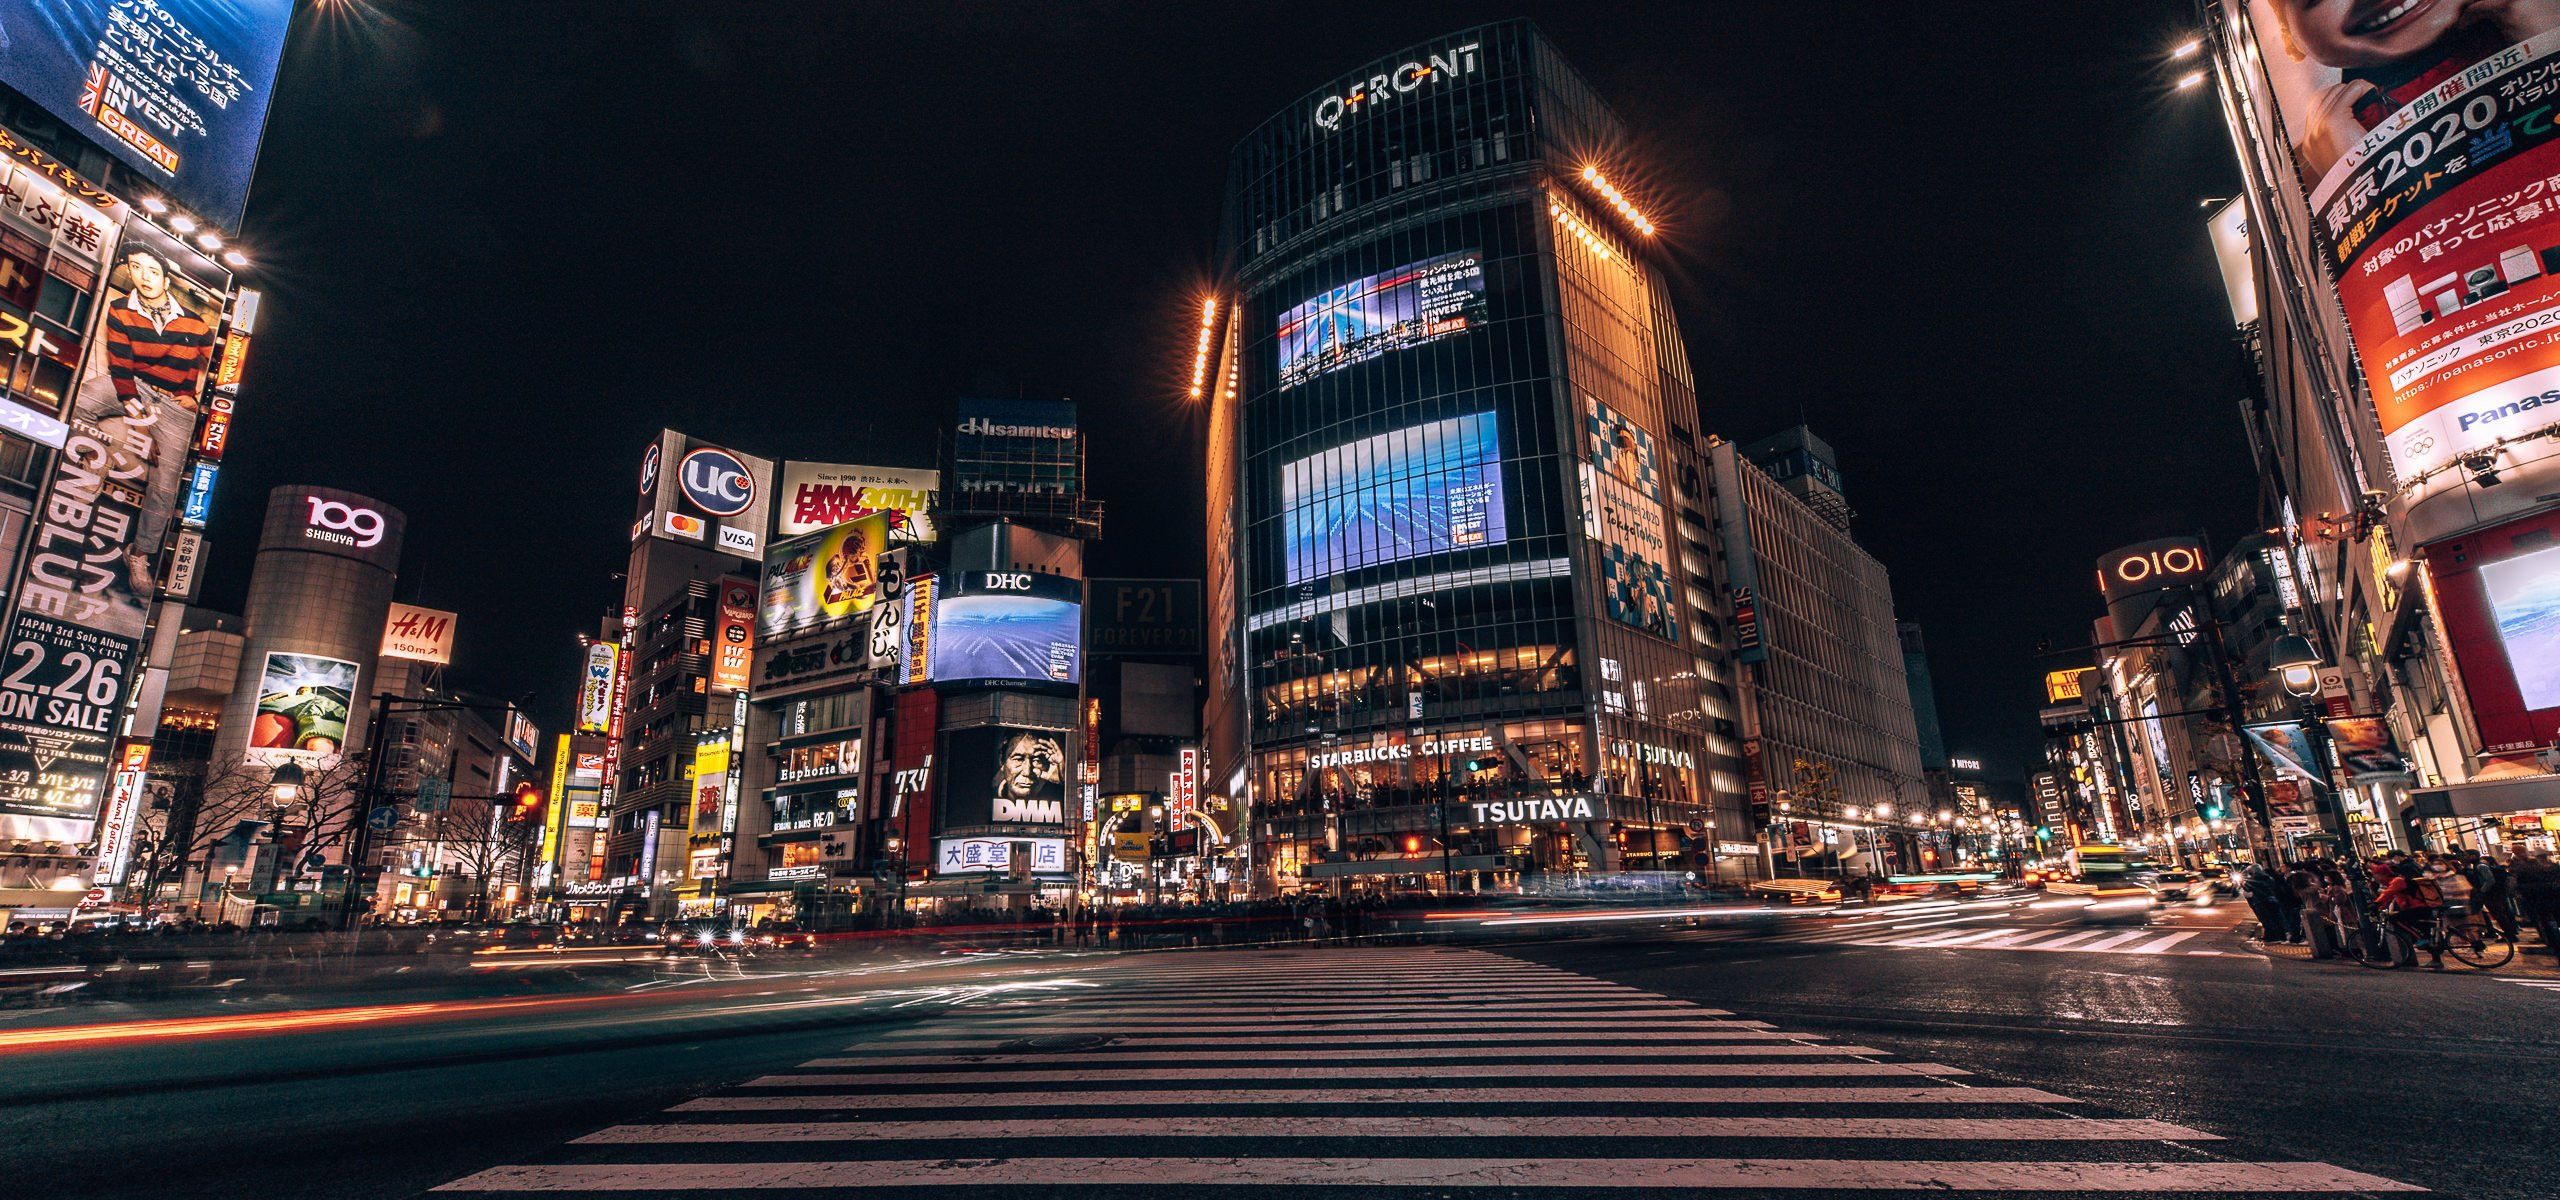 Shibuya Crossing by Night | Neighbourhood Guide Shibuya Tokyo